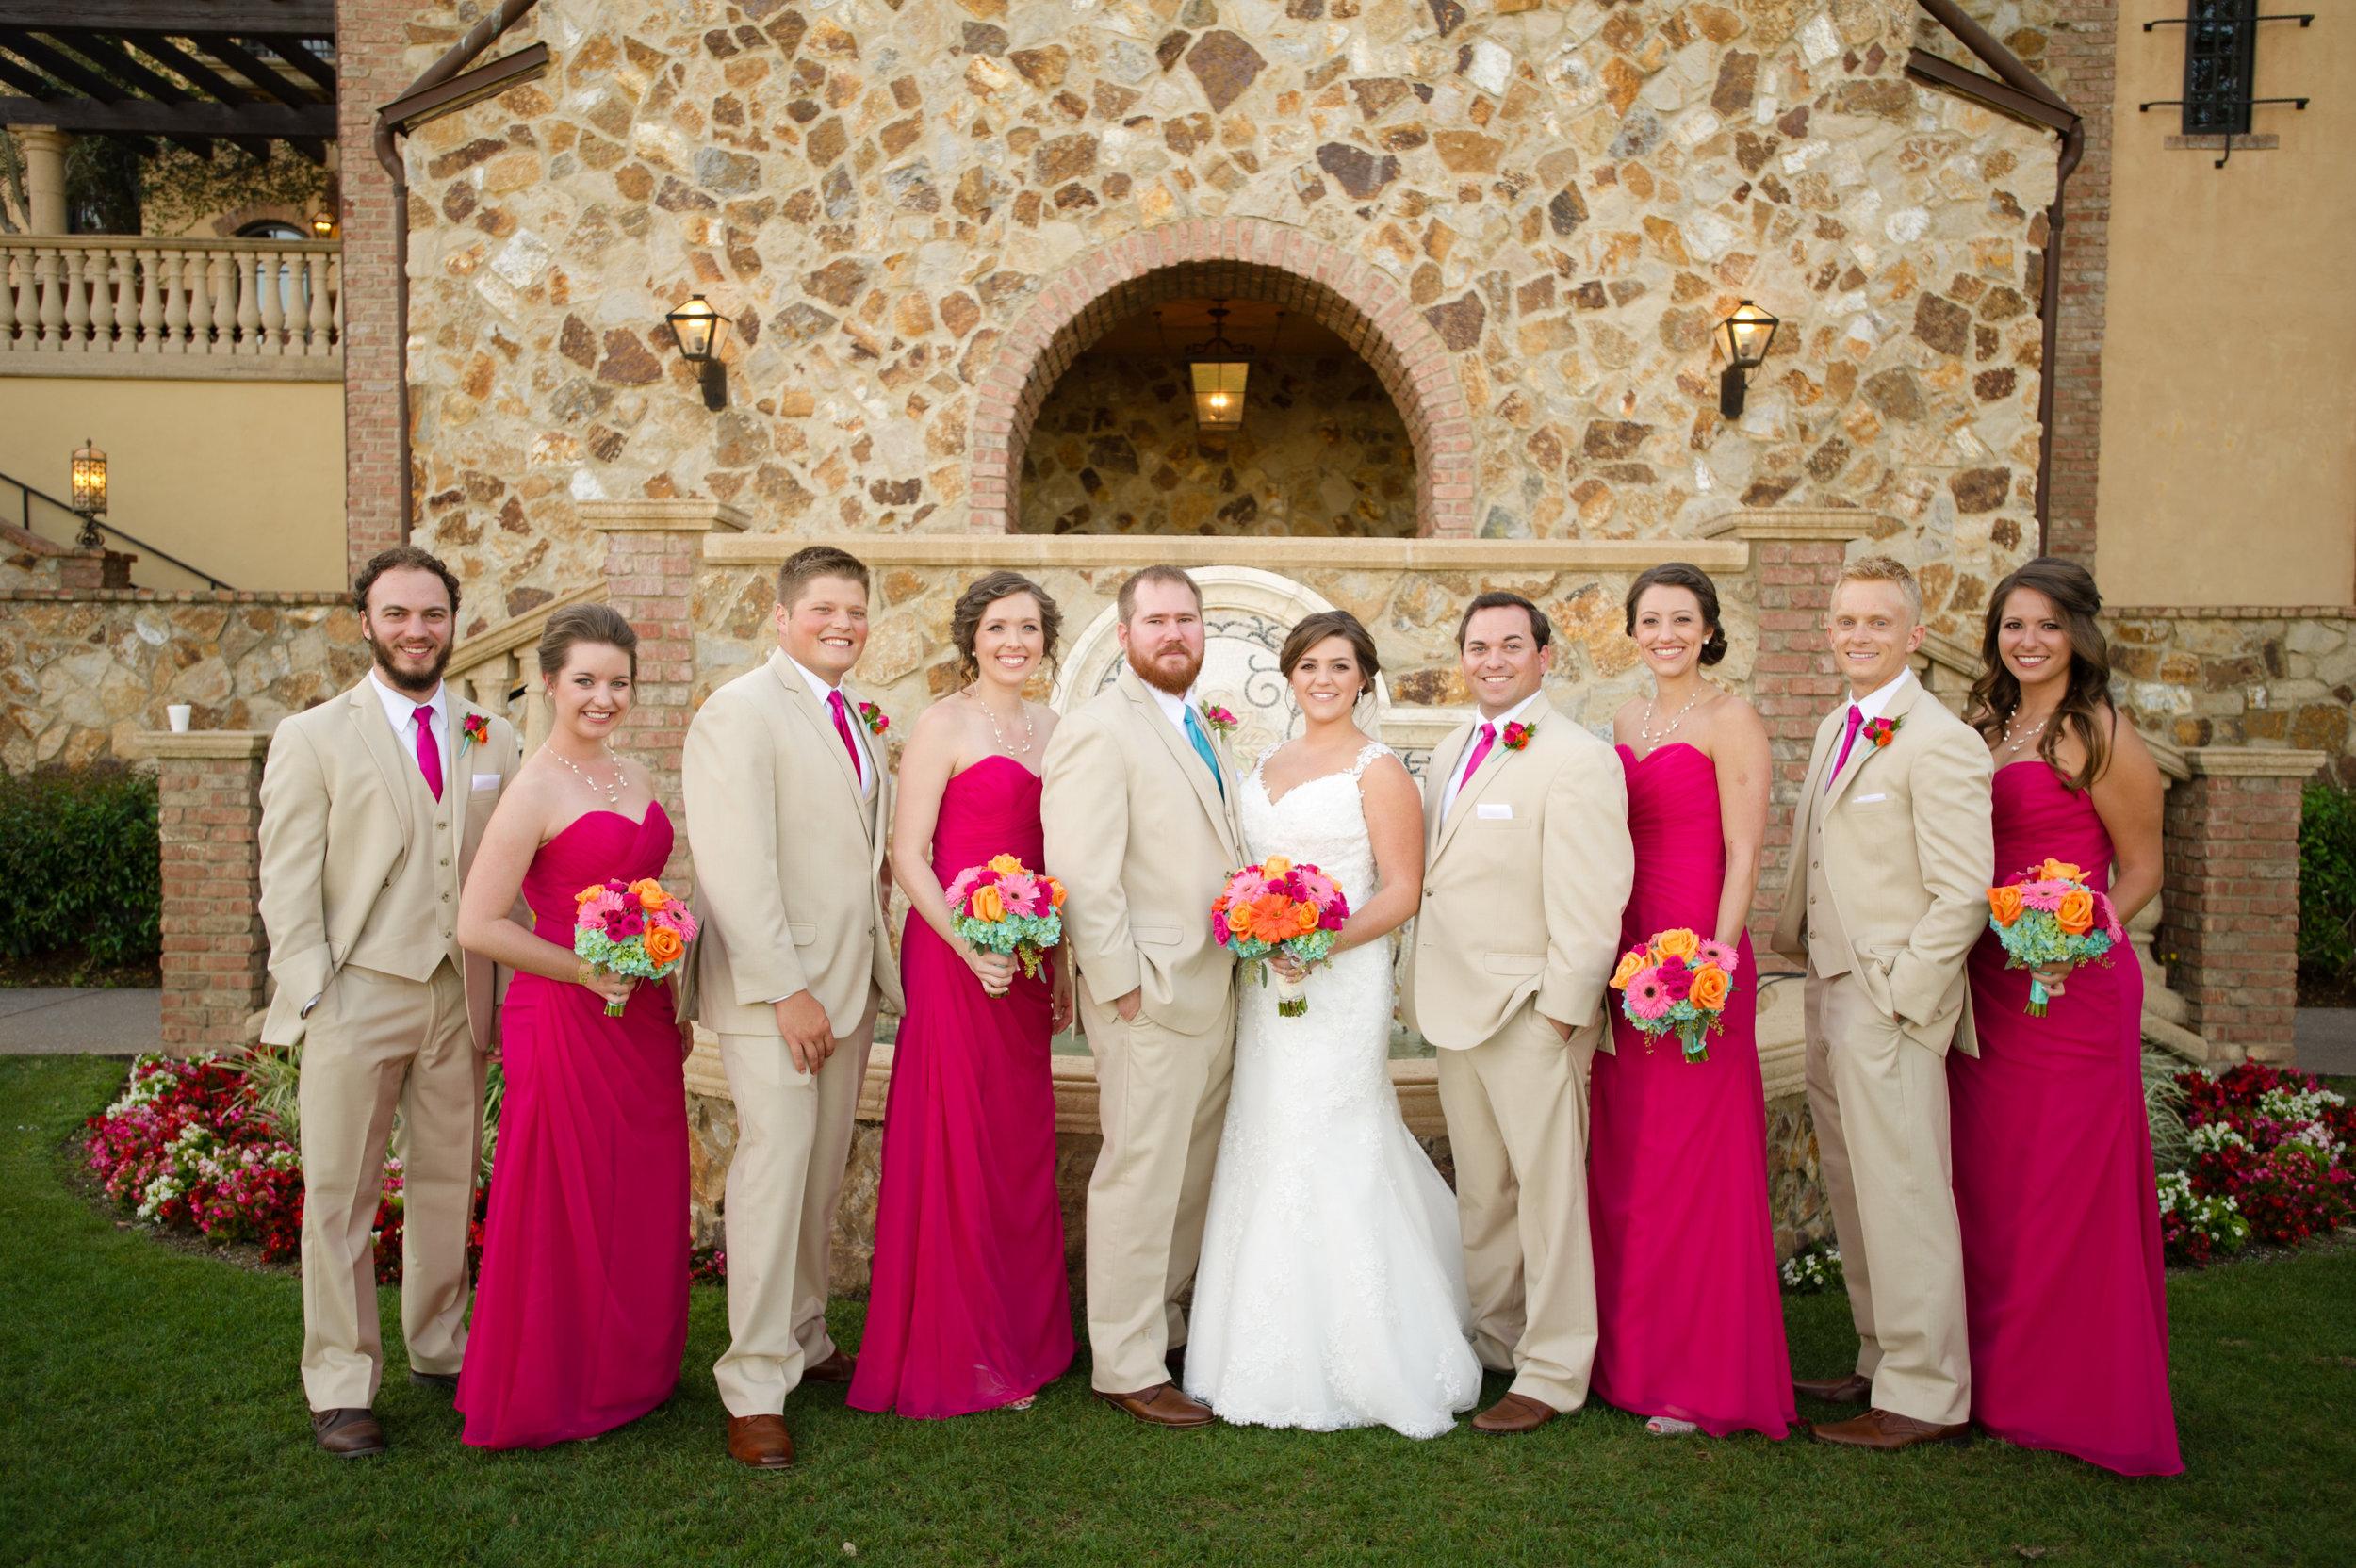 Wedding Dress - Bridesmaids dresses - Bella Collina Wedding Photography